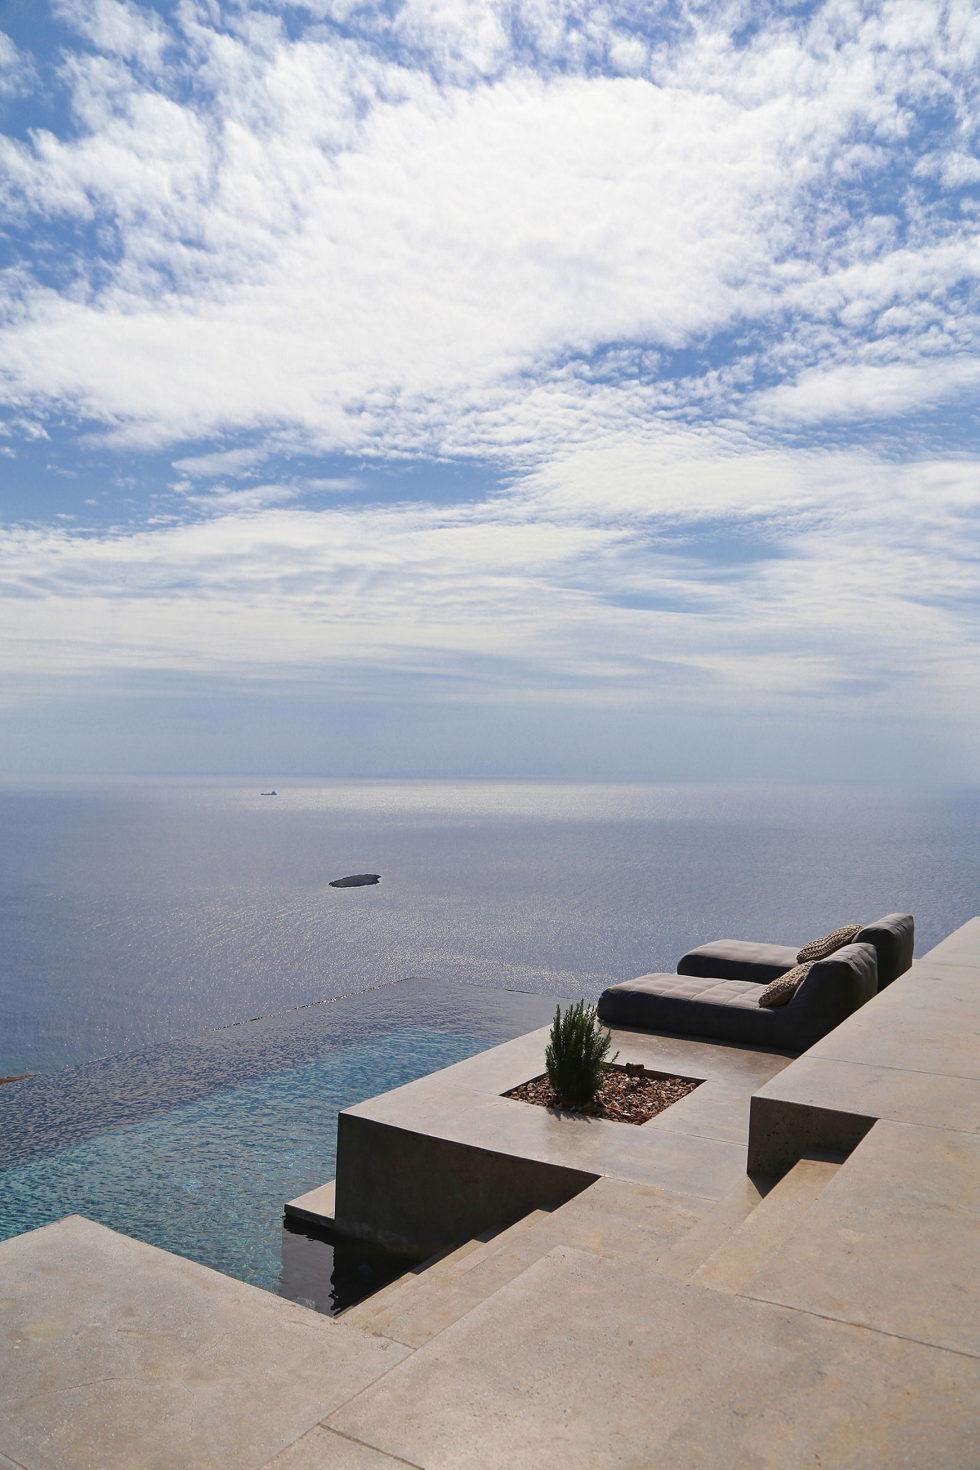 Syros II Residency On The Sunny Siros Island From Block722 Studio 4